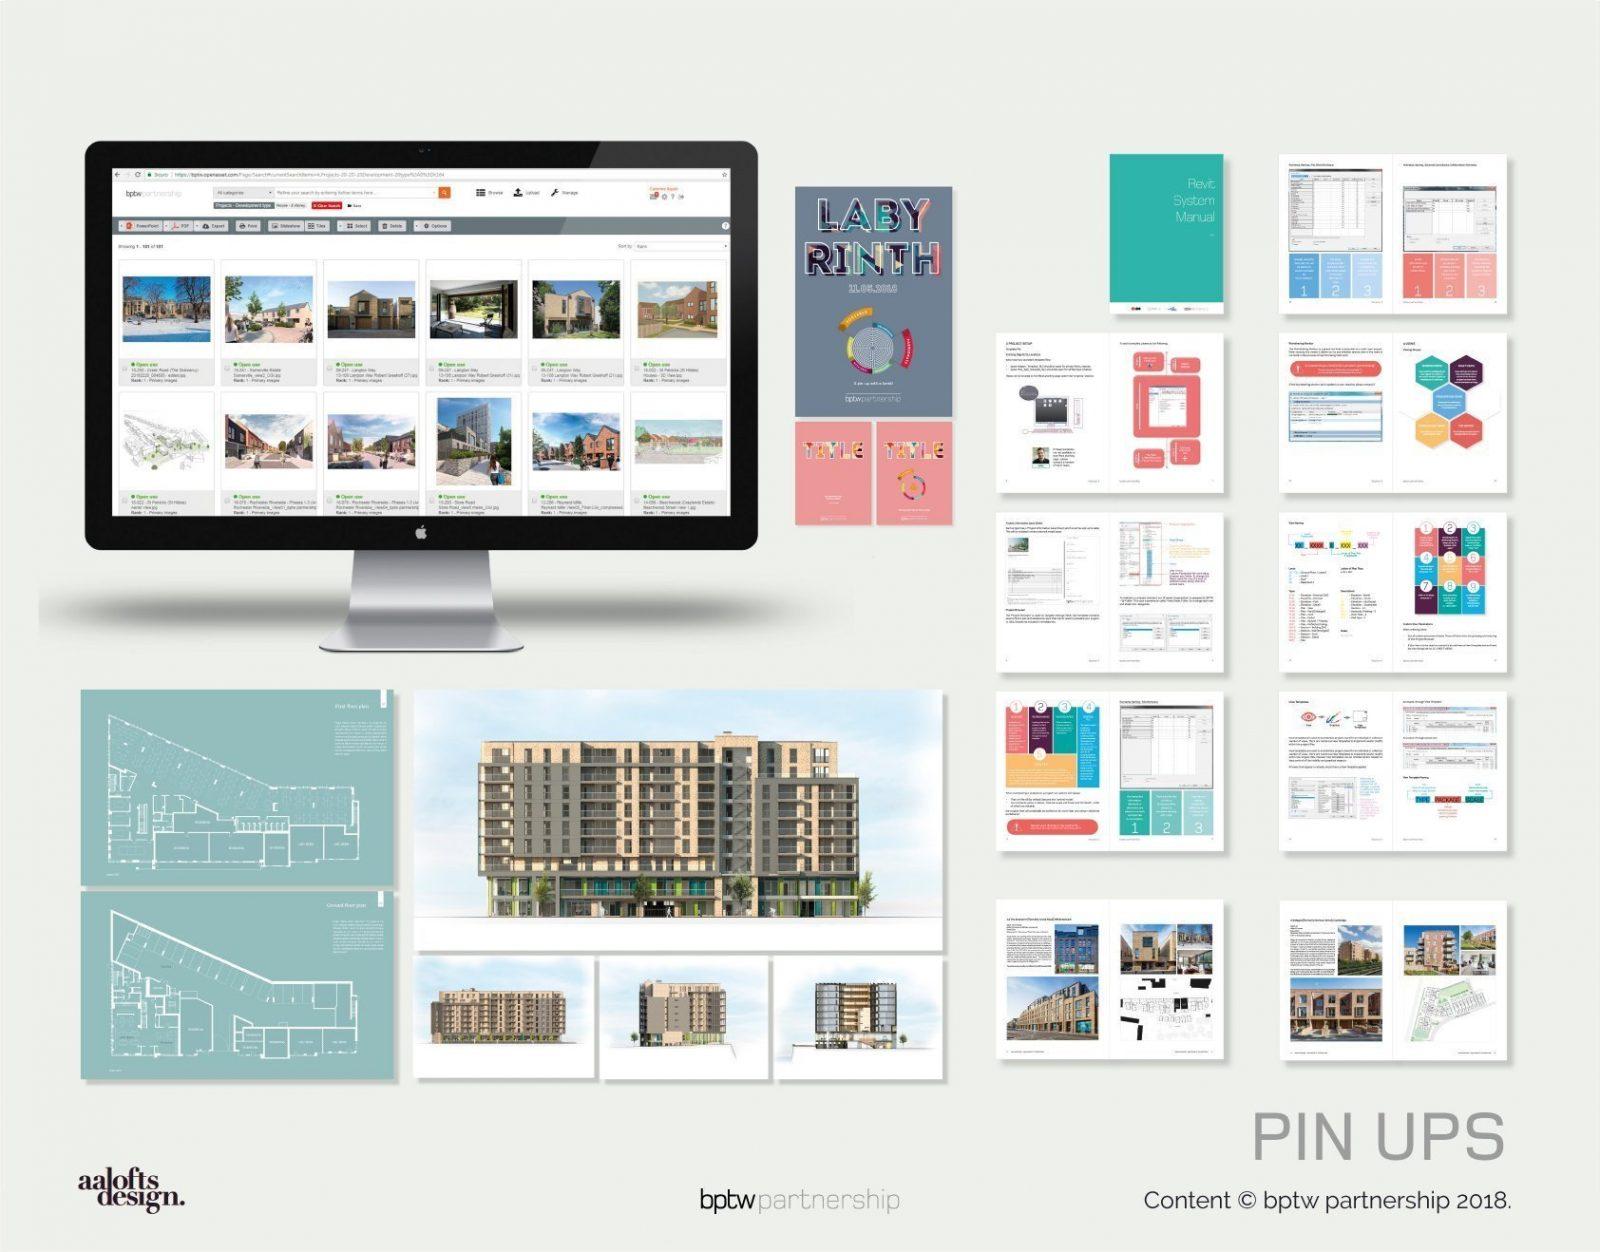 Pin Ups Thumbnail AALofts Design